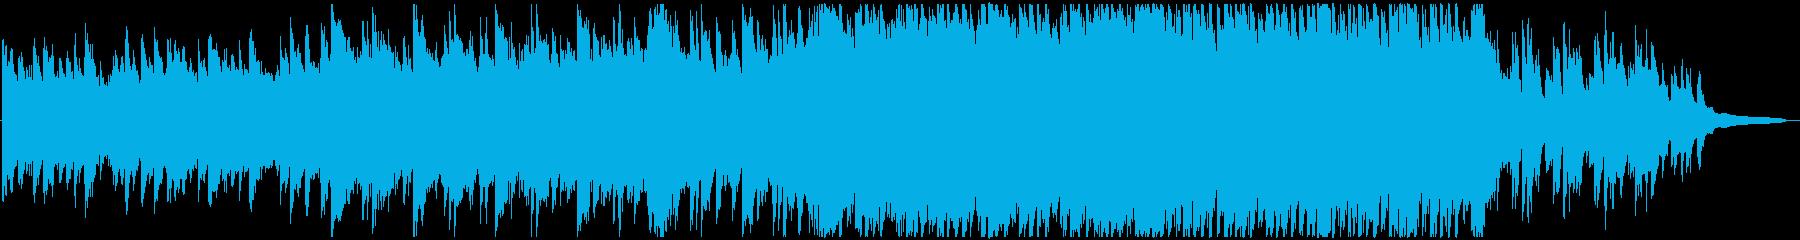 VP系7、ピアノ&オーケストラ、感動的Aの再生済みの波形